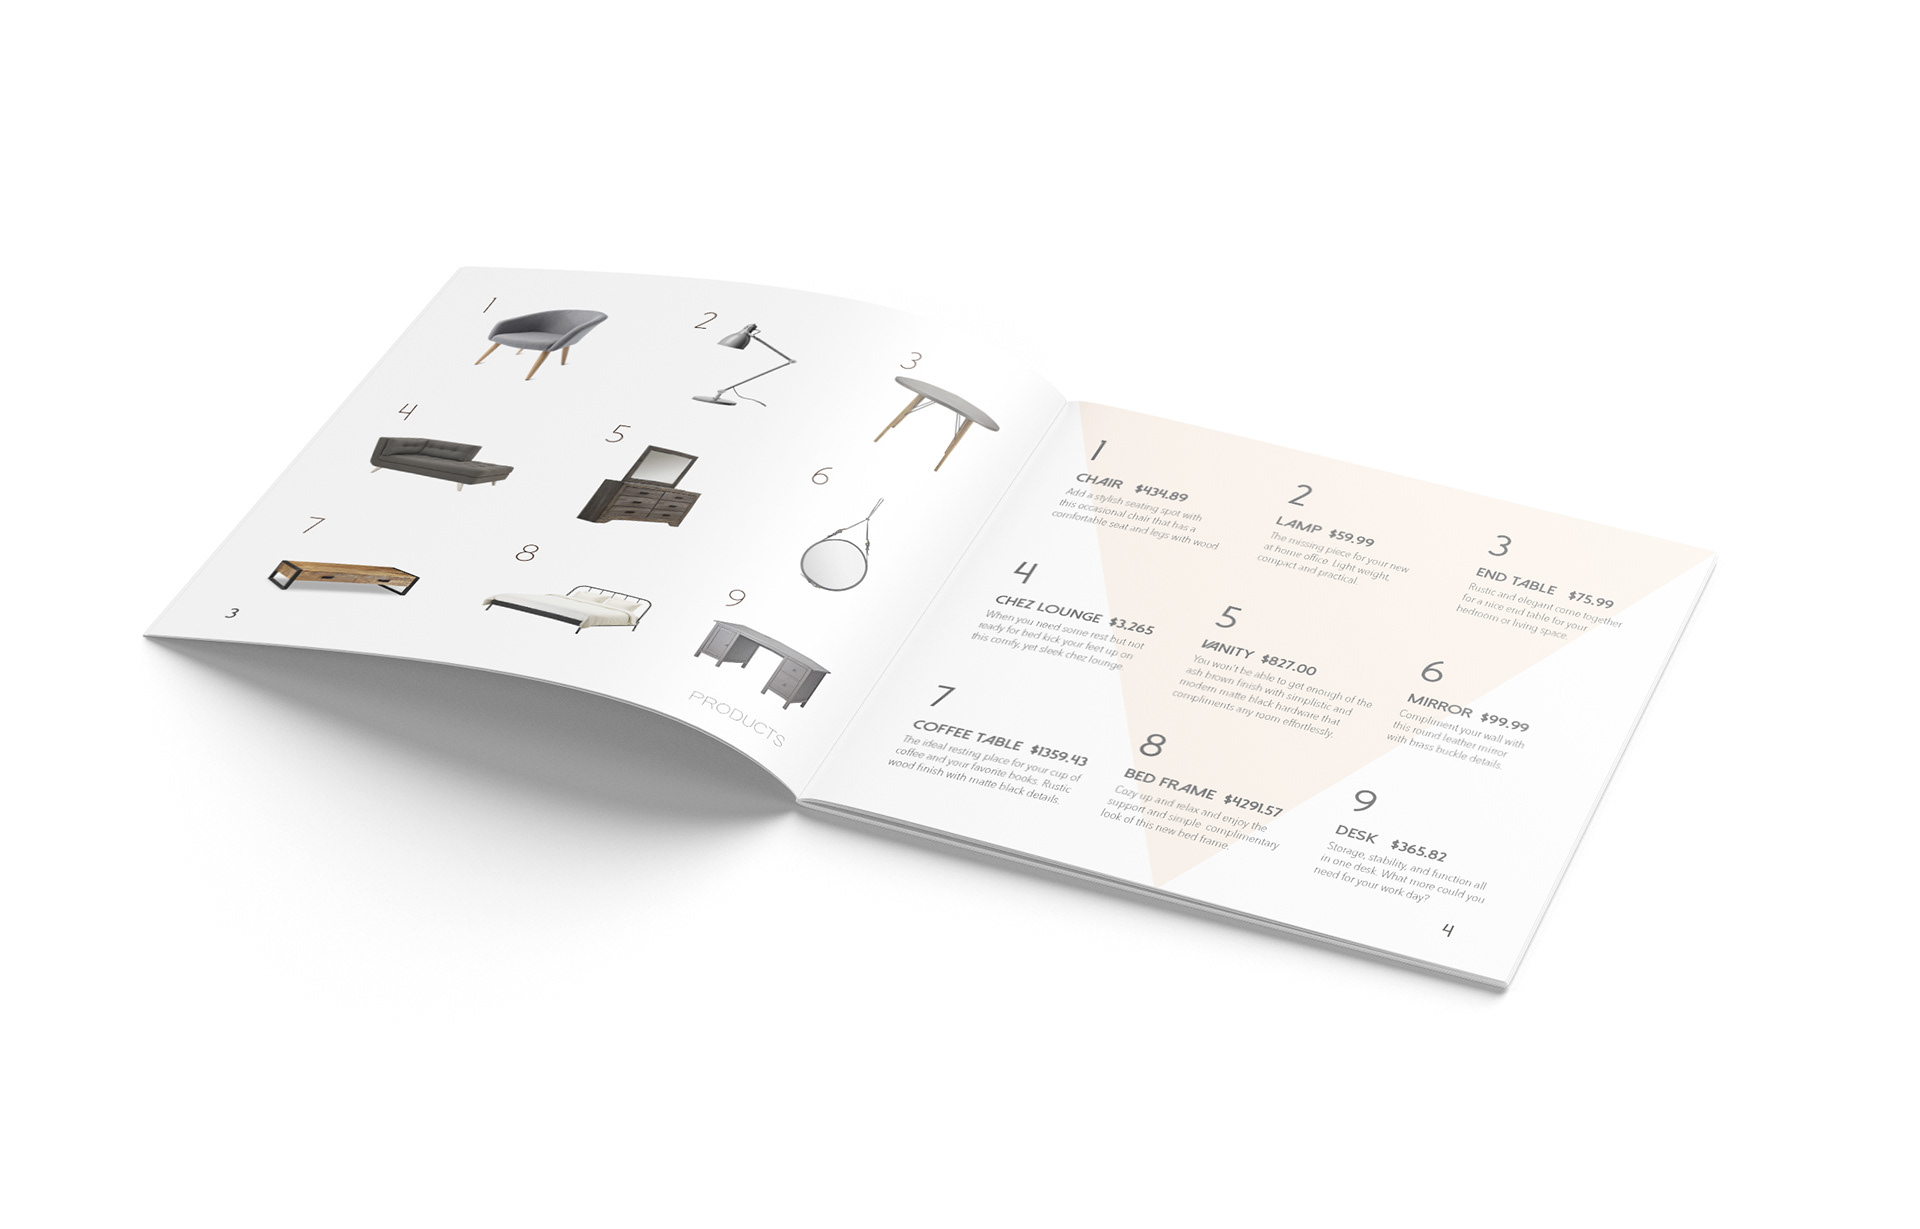 Madison Rogers - Caravan Furniture Catalogue